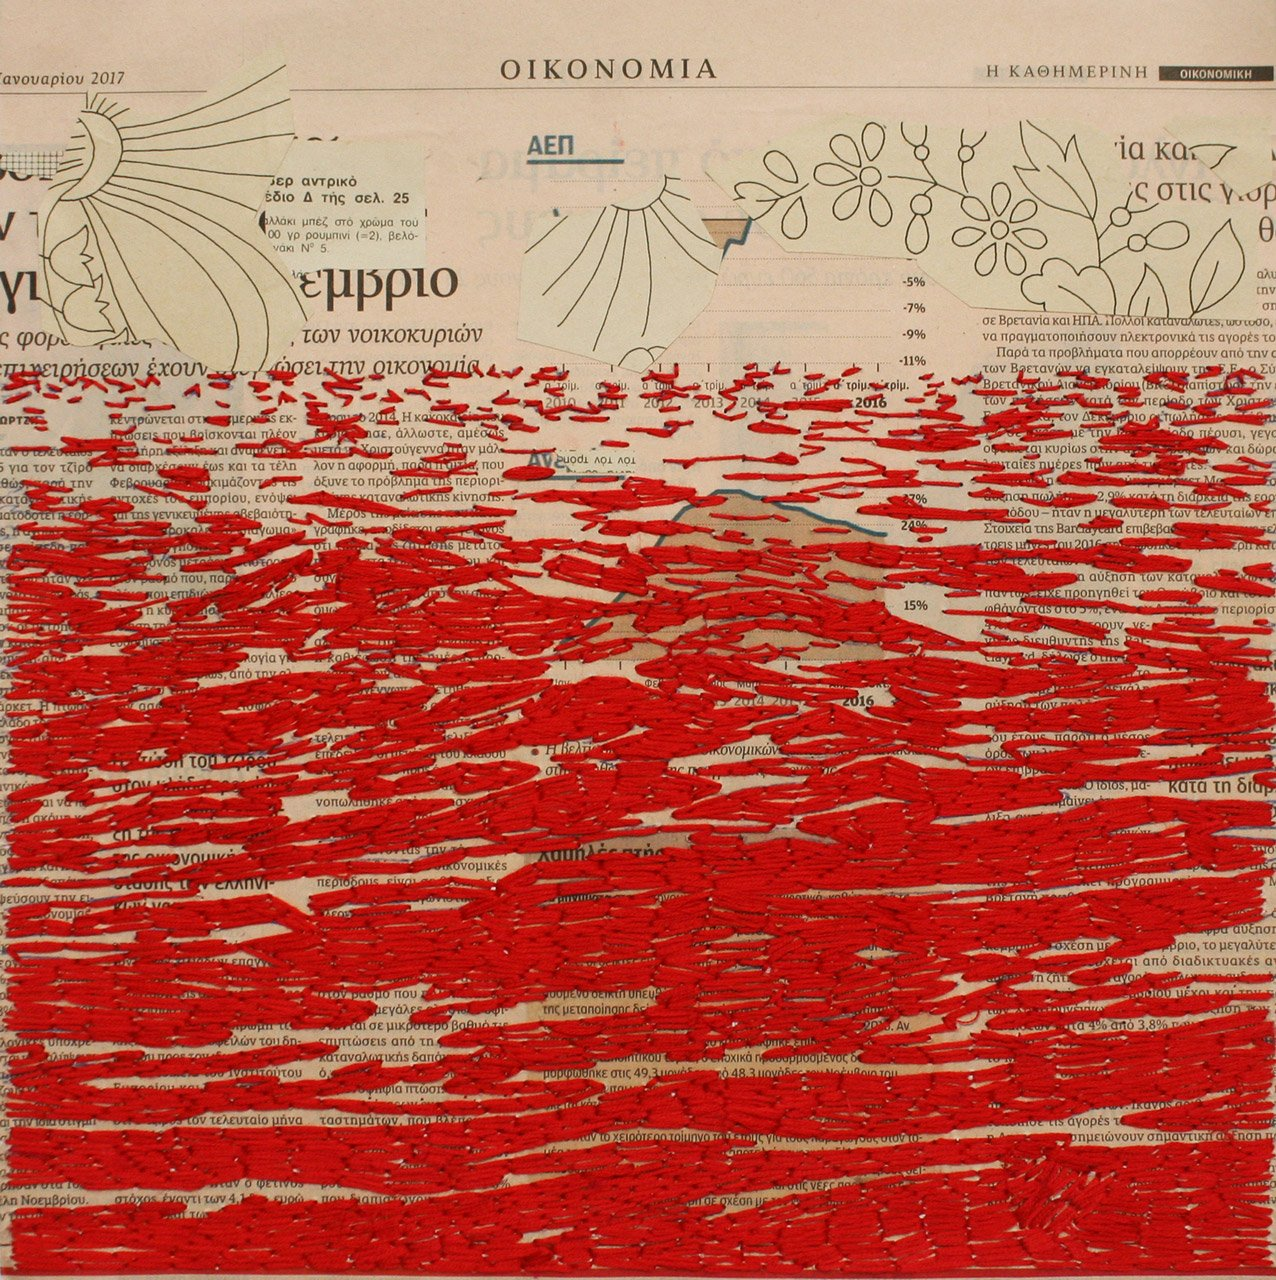 Red Sea I - Dimitra Chanioti